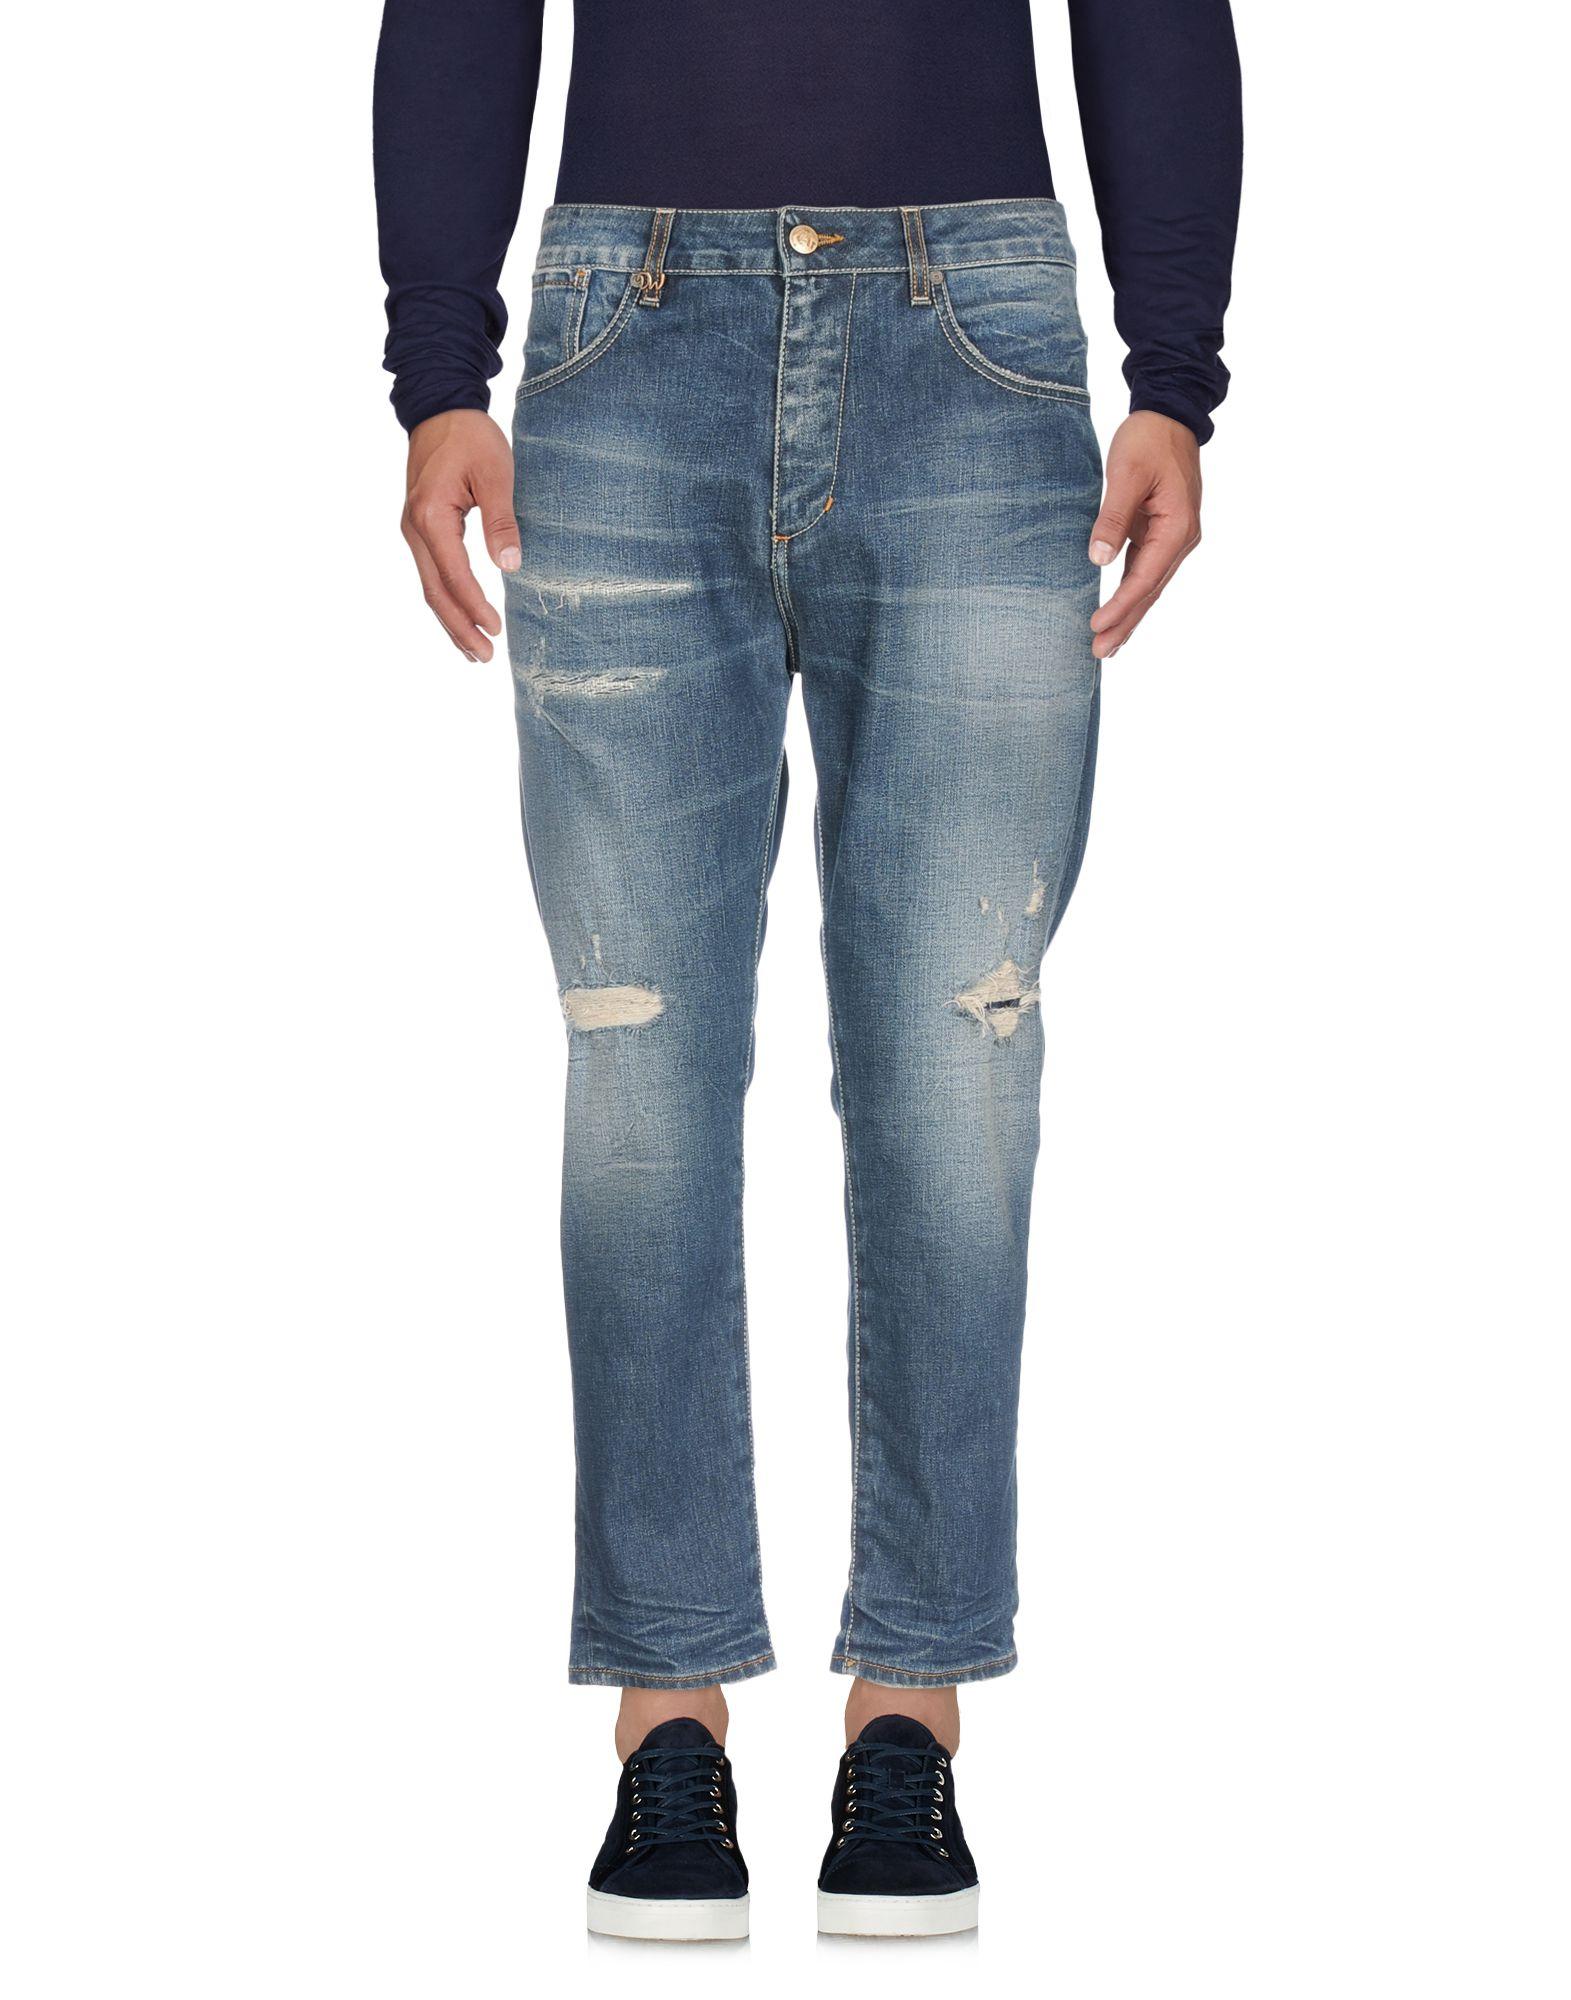 Pantaloni Jeans Dw⁵ Uomo - Acquista online su